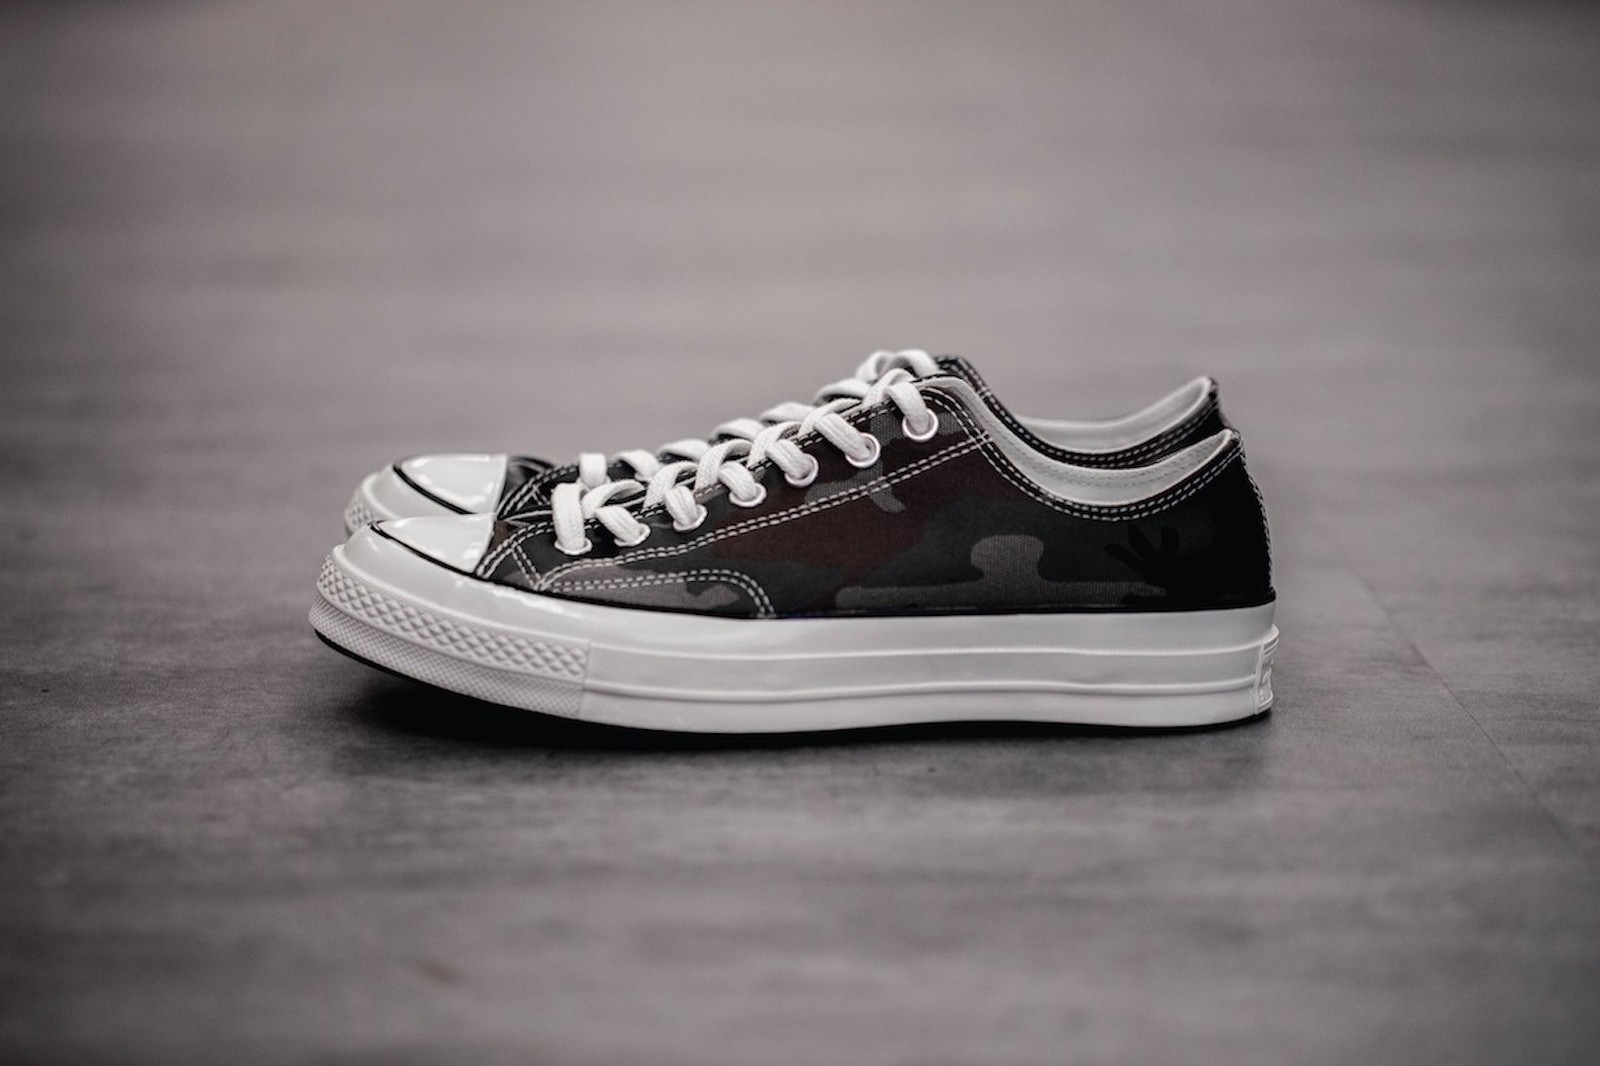 carhartt wip converse chuck 70 low collaboration sneakers tea you apres sport sweatshirt crewneck